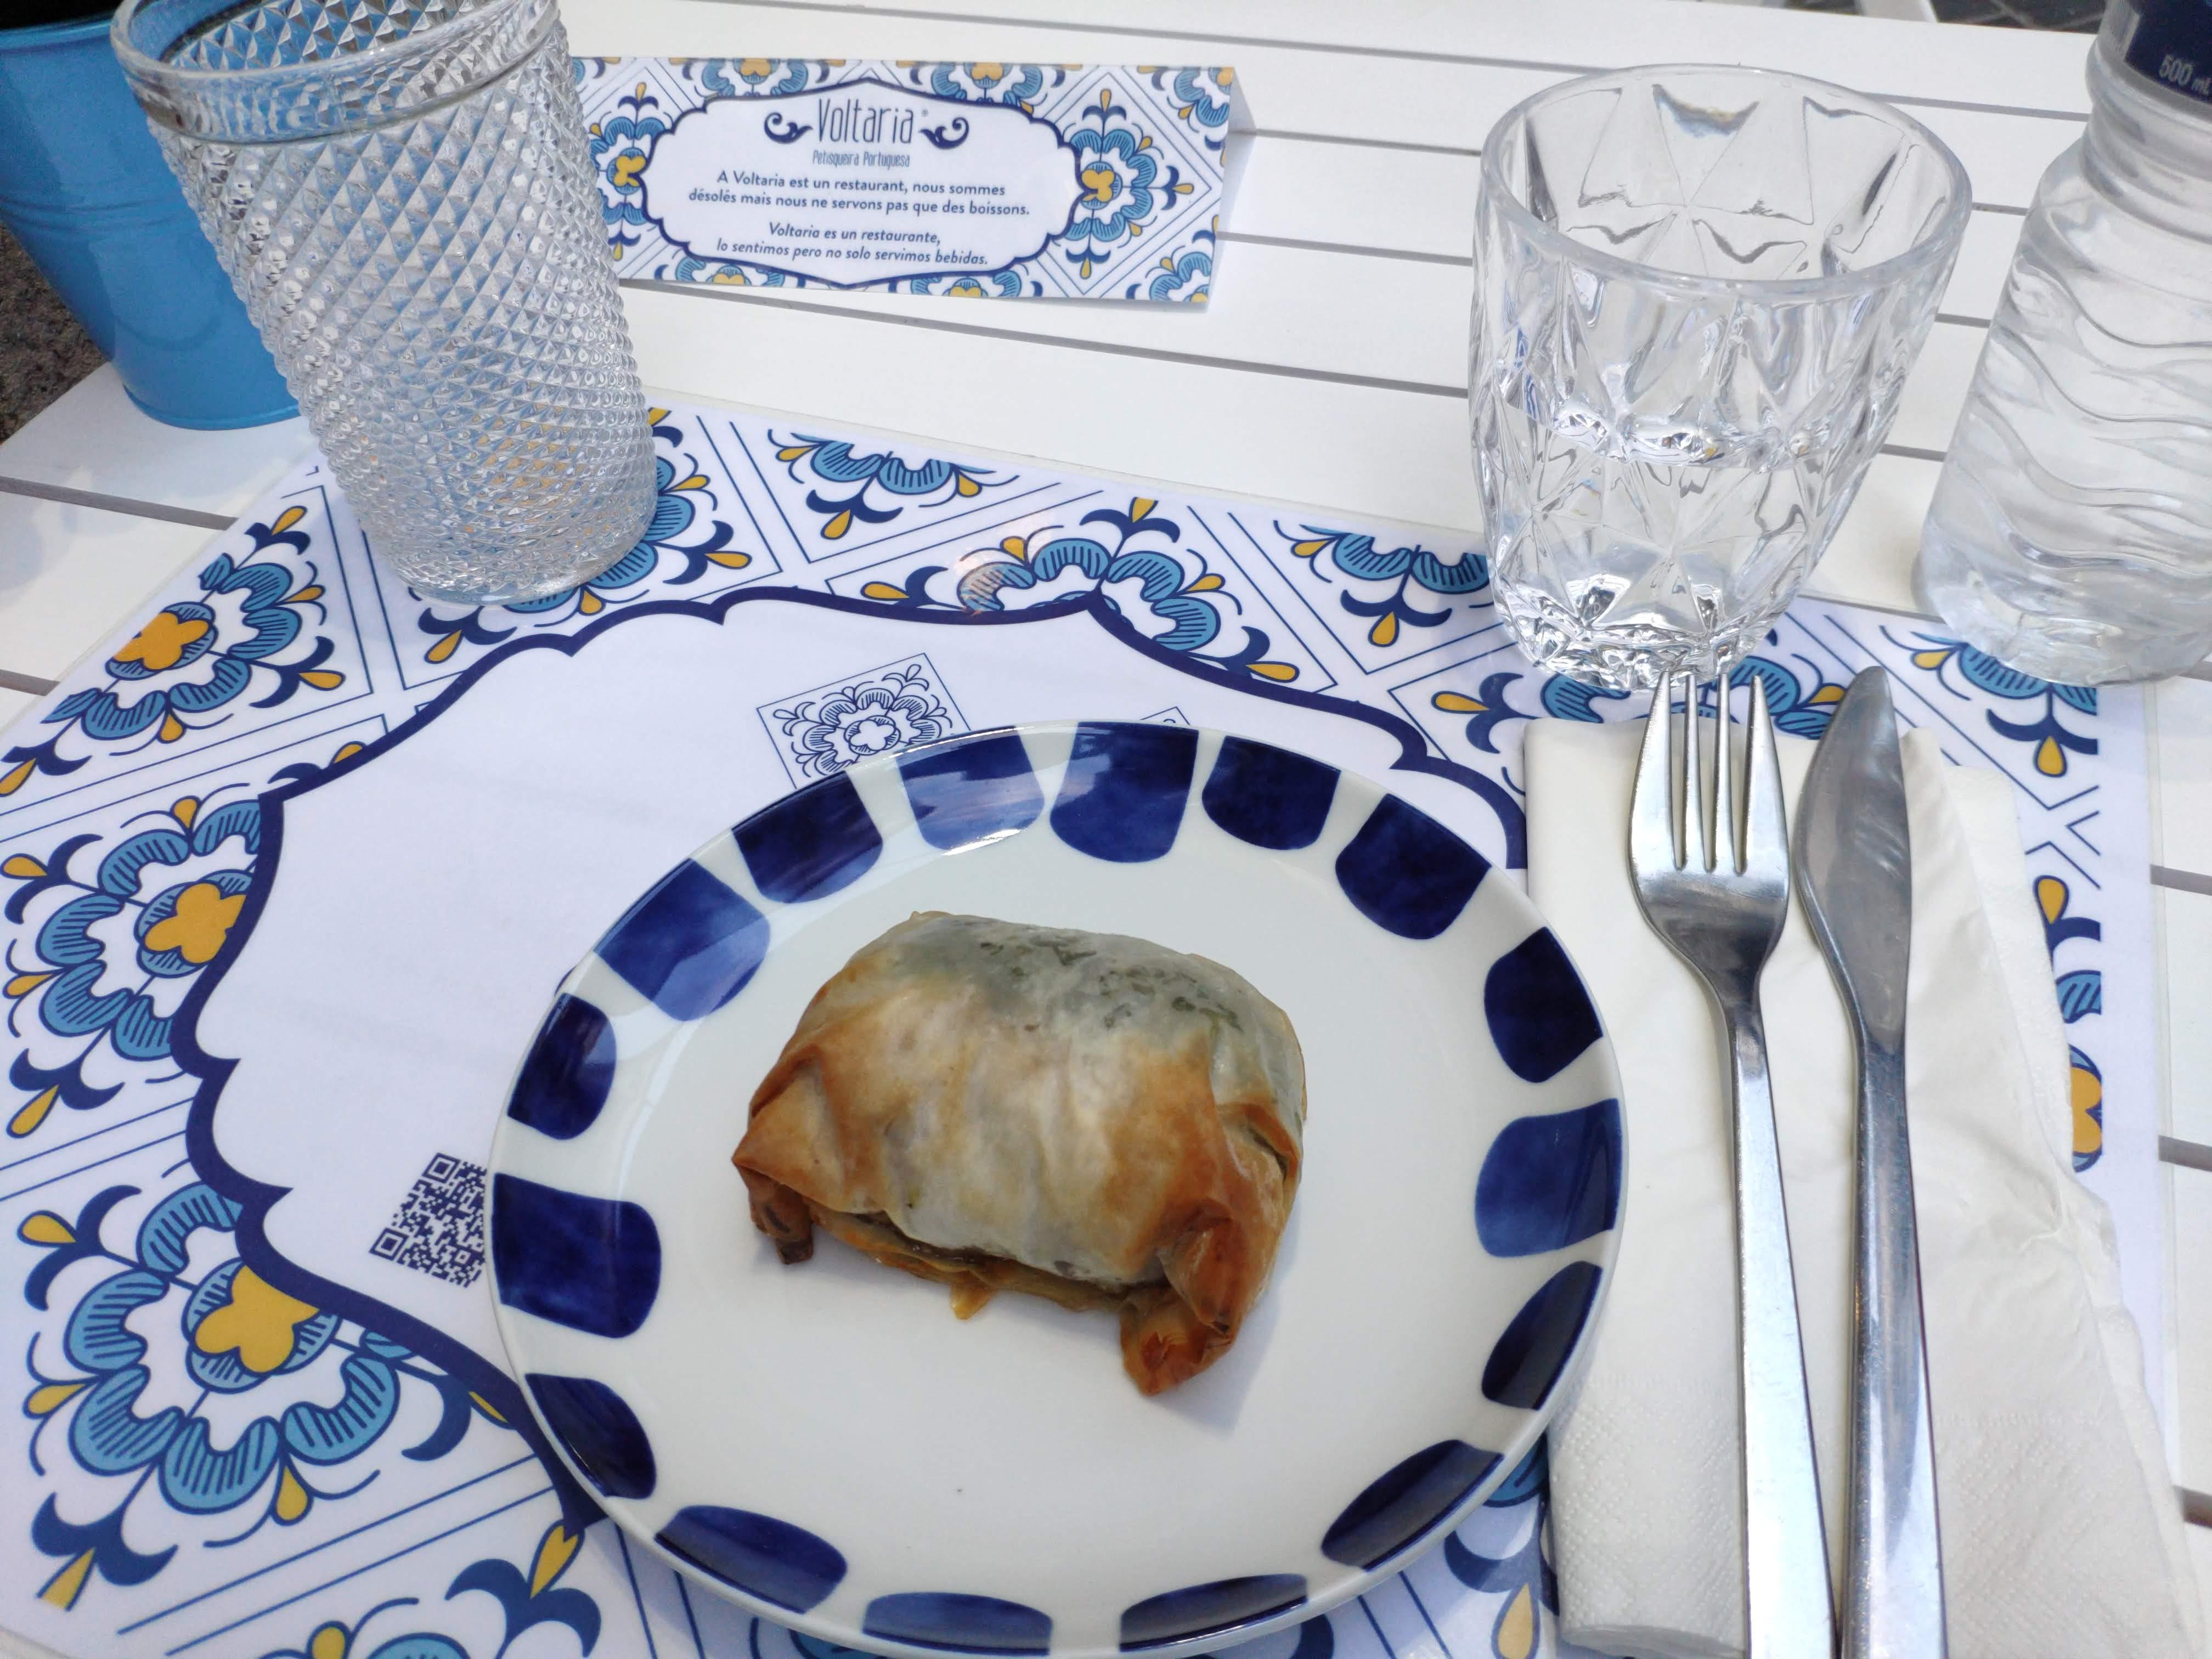 https://foodloader.net/nico_2020-09-22_tentugal-de-alheira.jpg